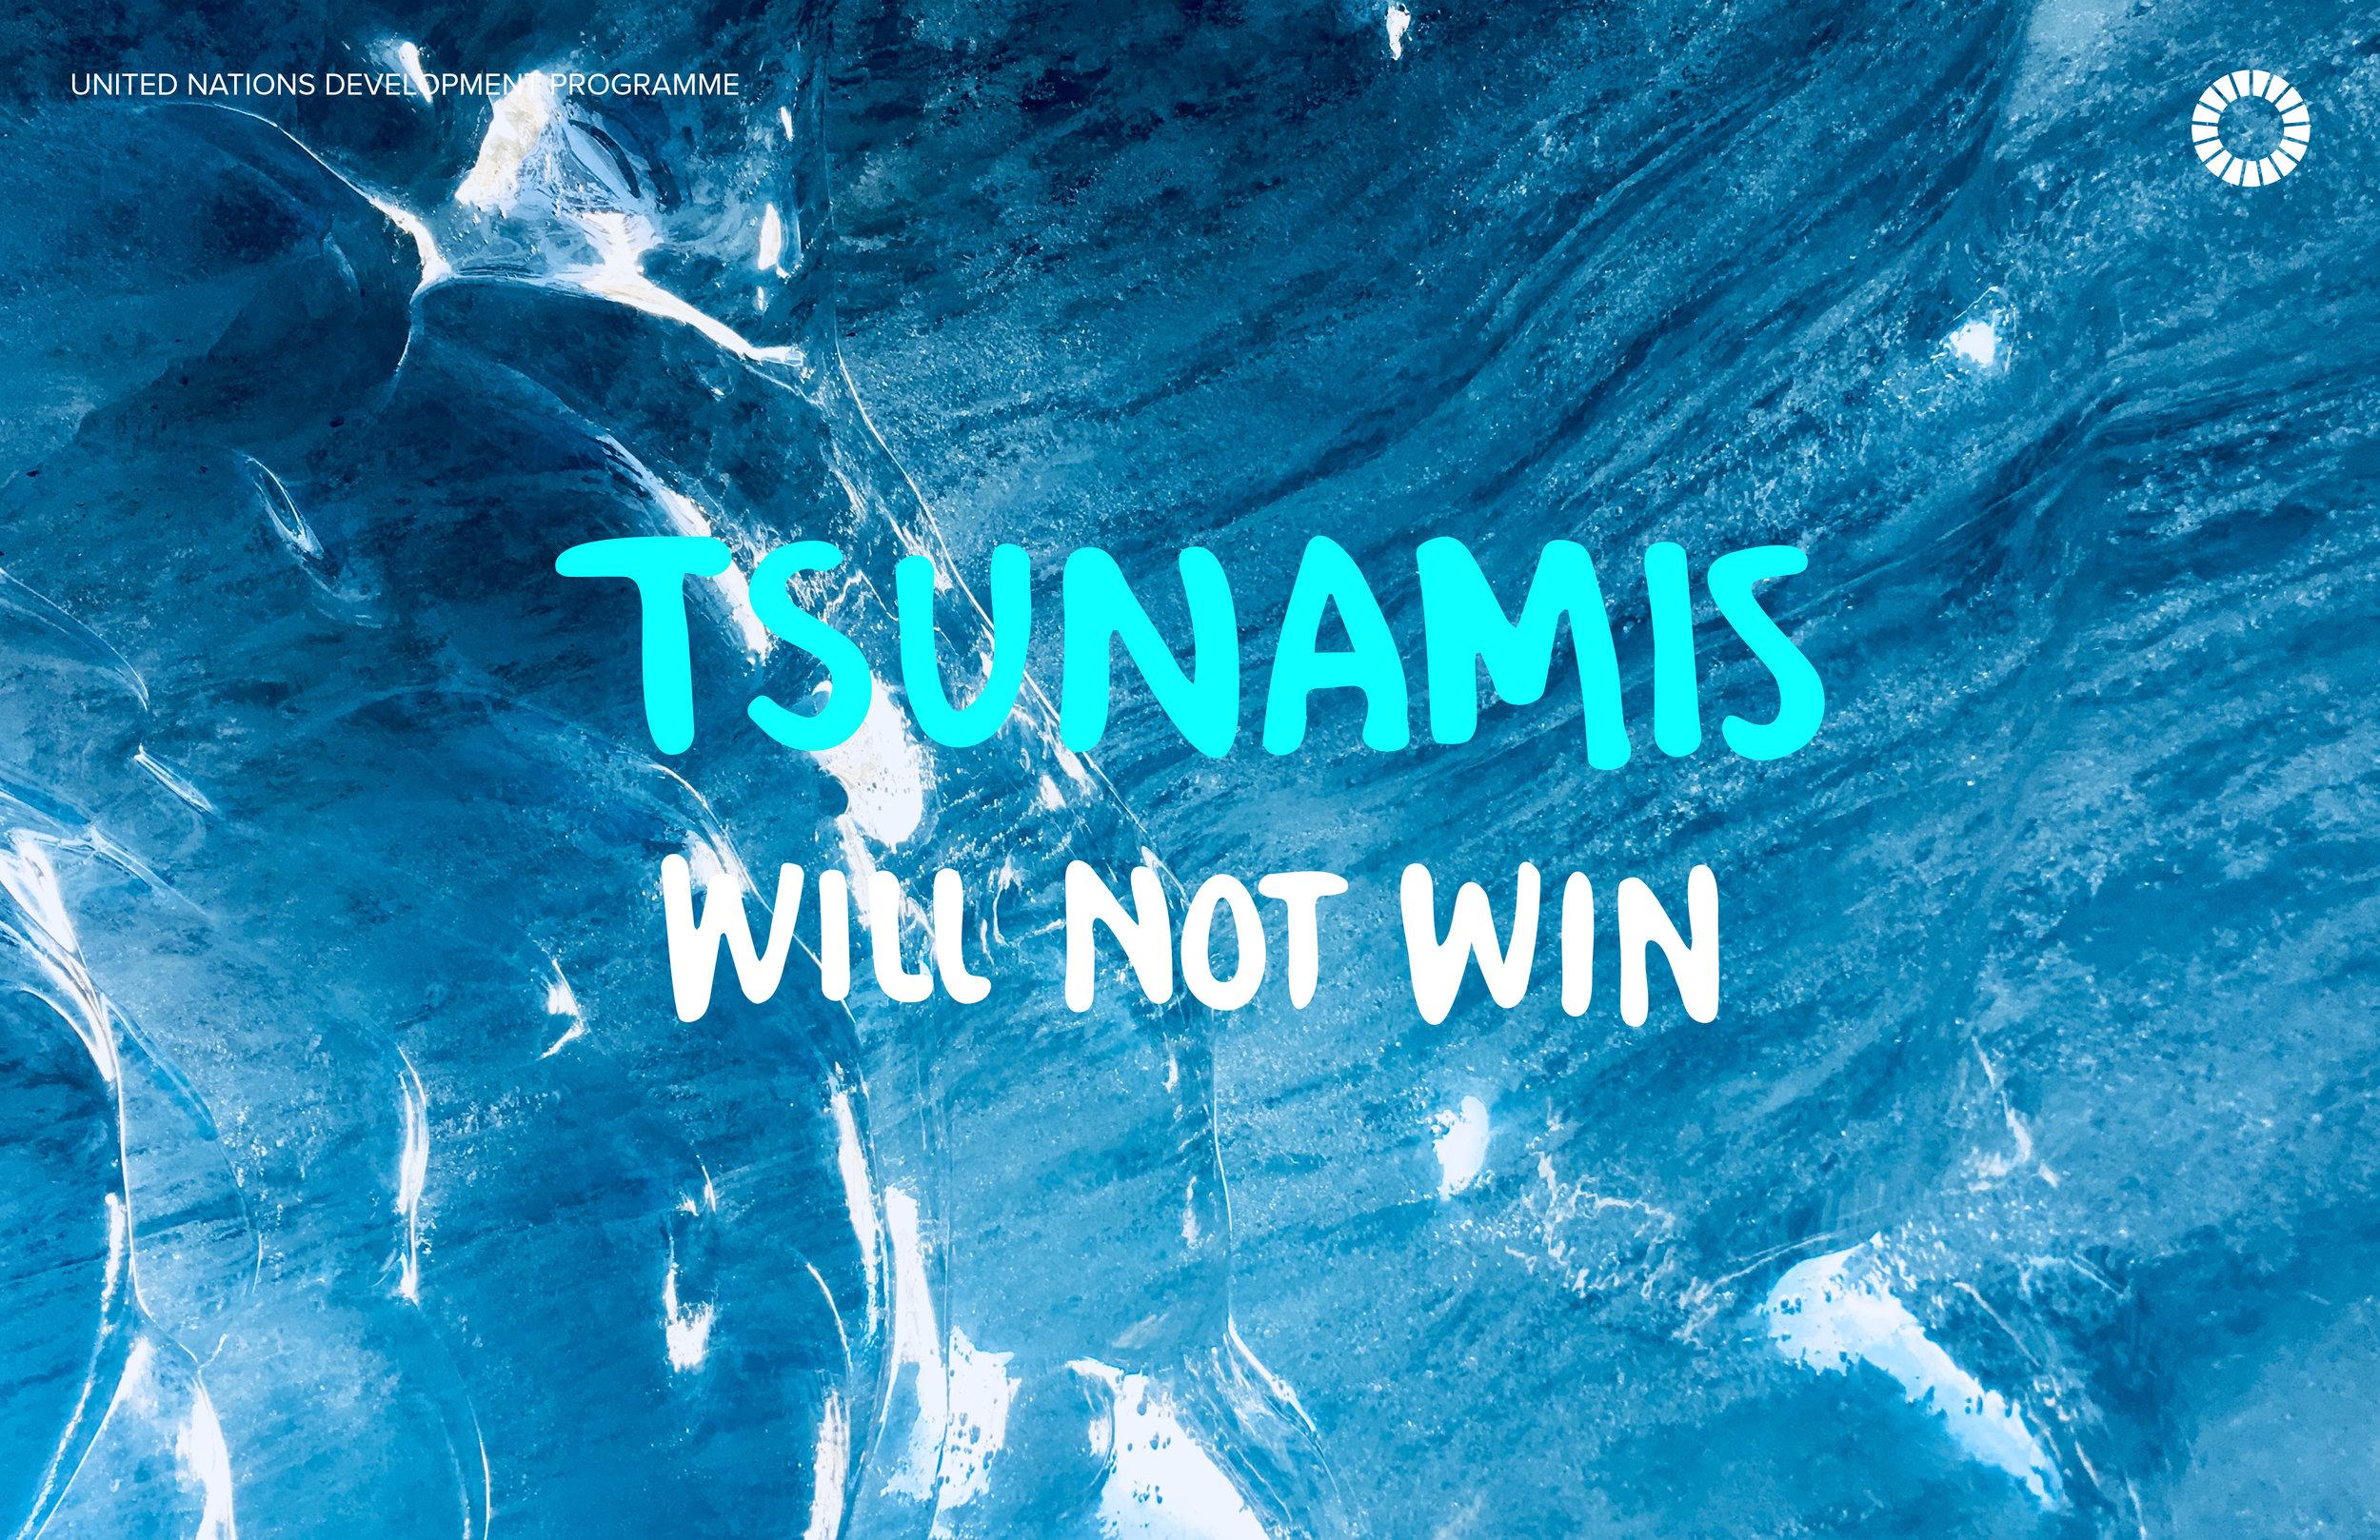 4. Tsunamis.jpg